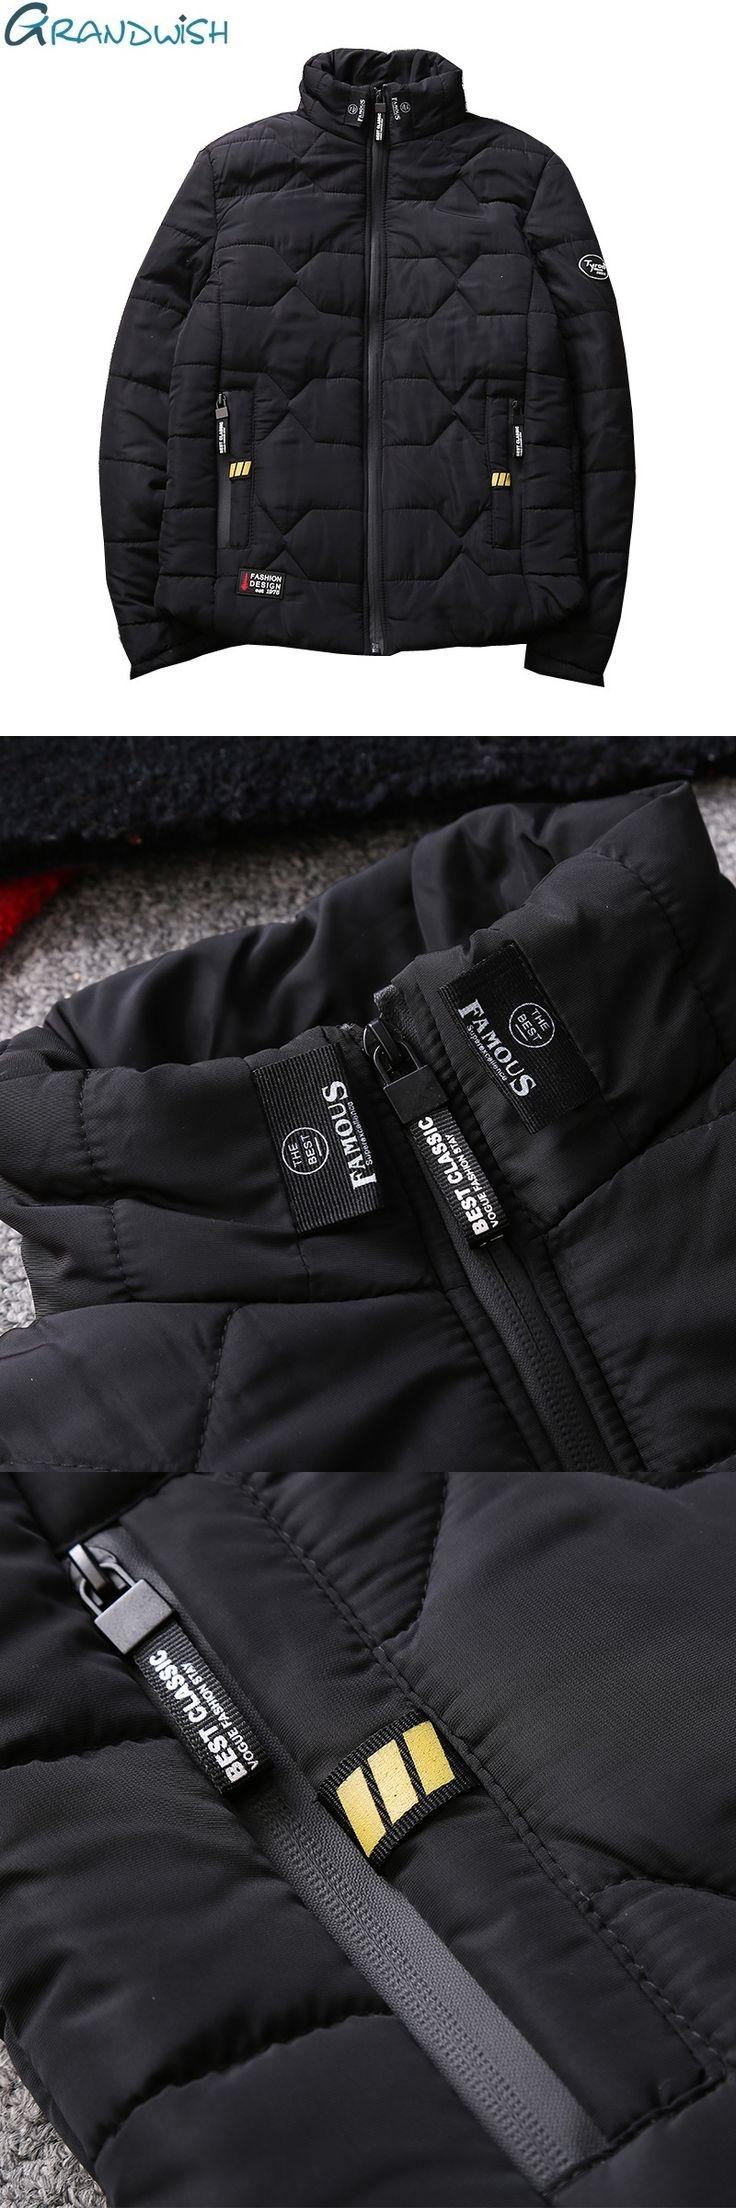 Grandwish Thick Cotton Padded Jacket Mens Stand Collar 2017 Fashion Winter Parkas Male Zipper Pocket Men's Parkas Jacket,DA421